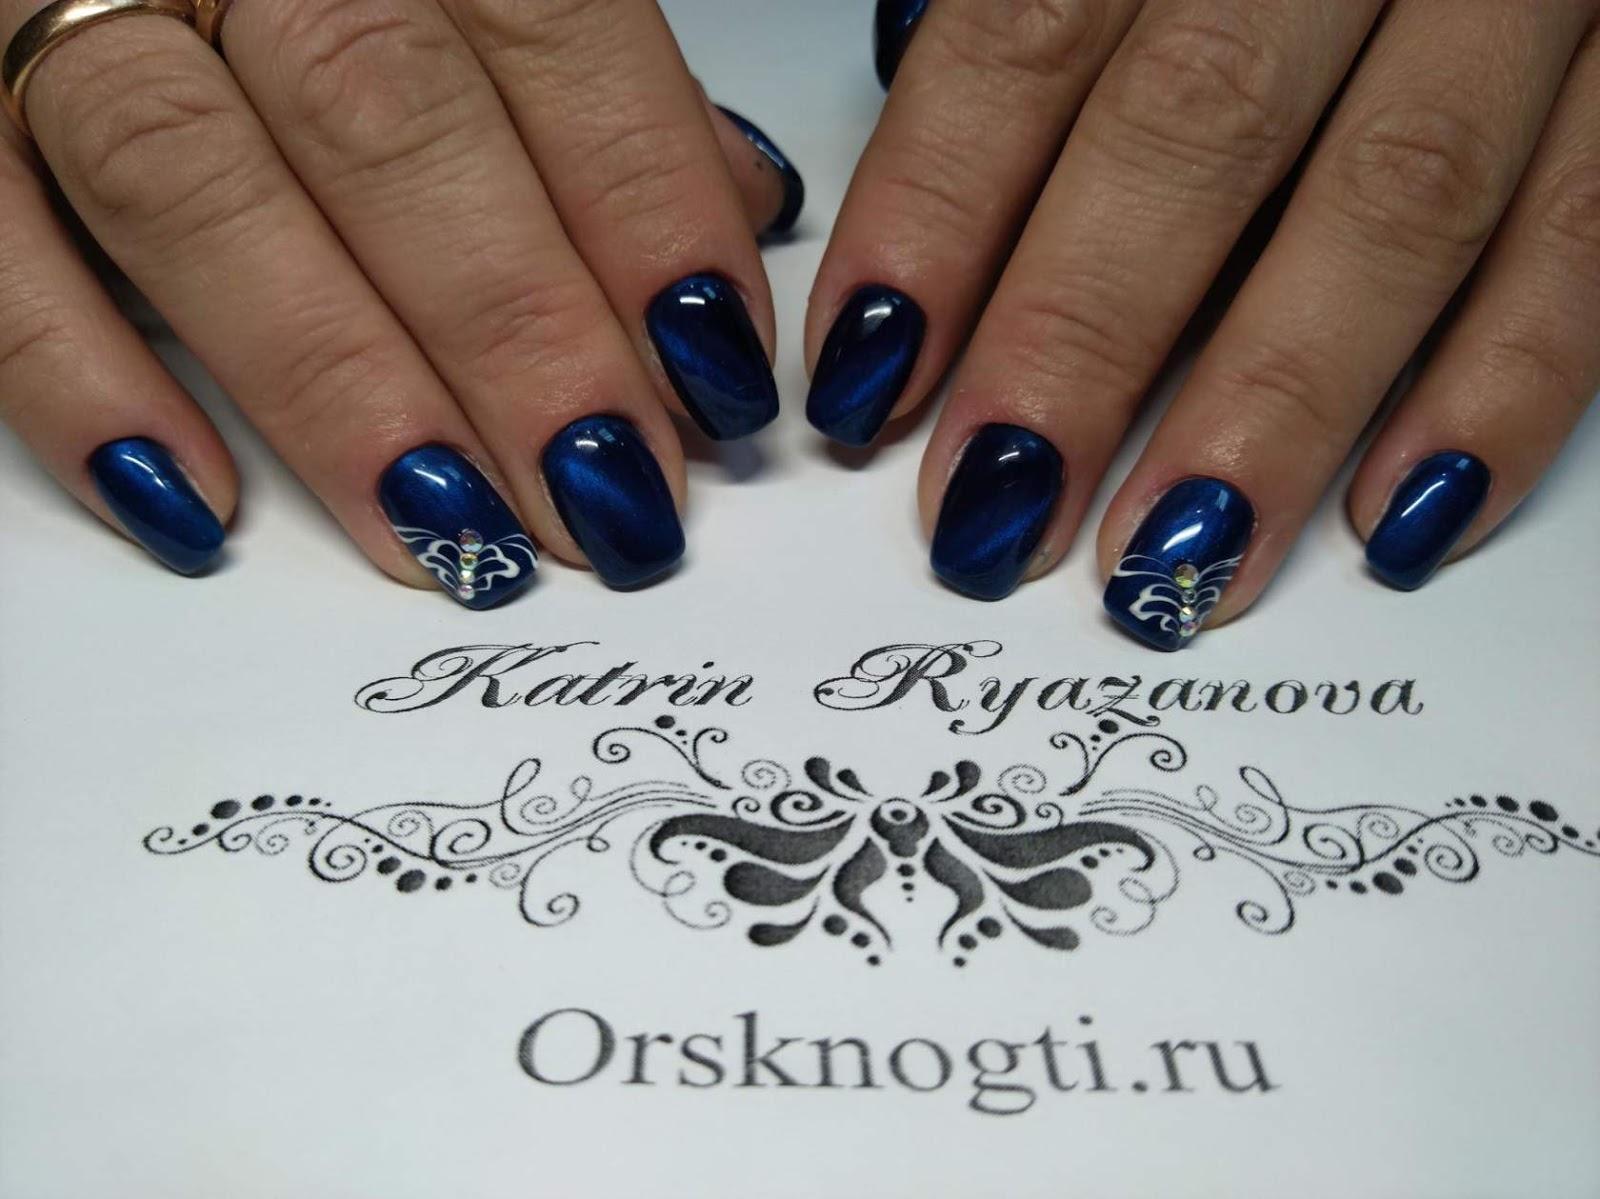 Black & White Nails Art Disign: Magic Nails Indiana Pa